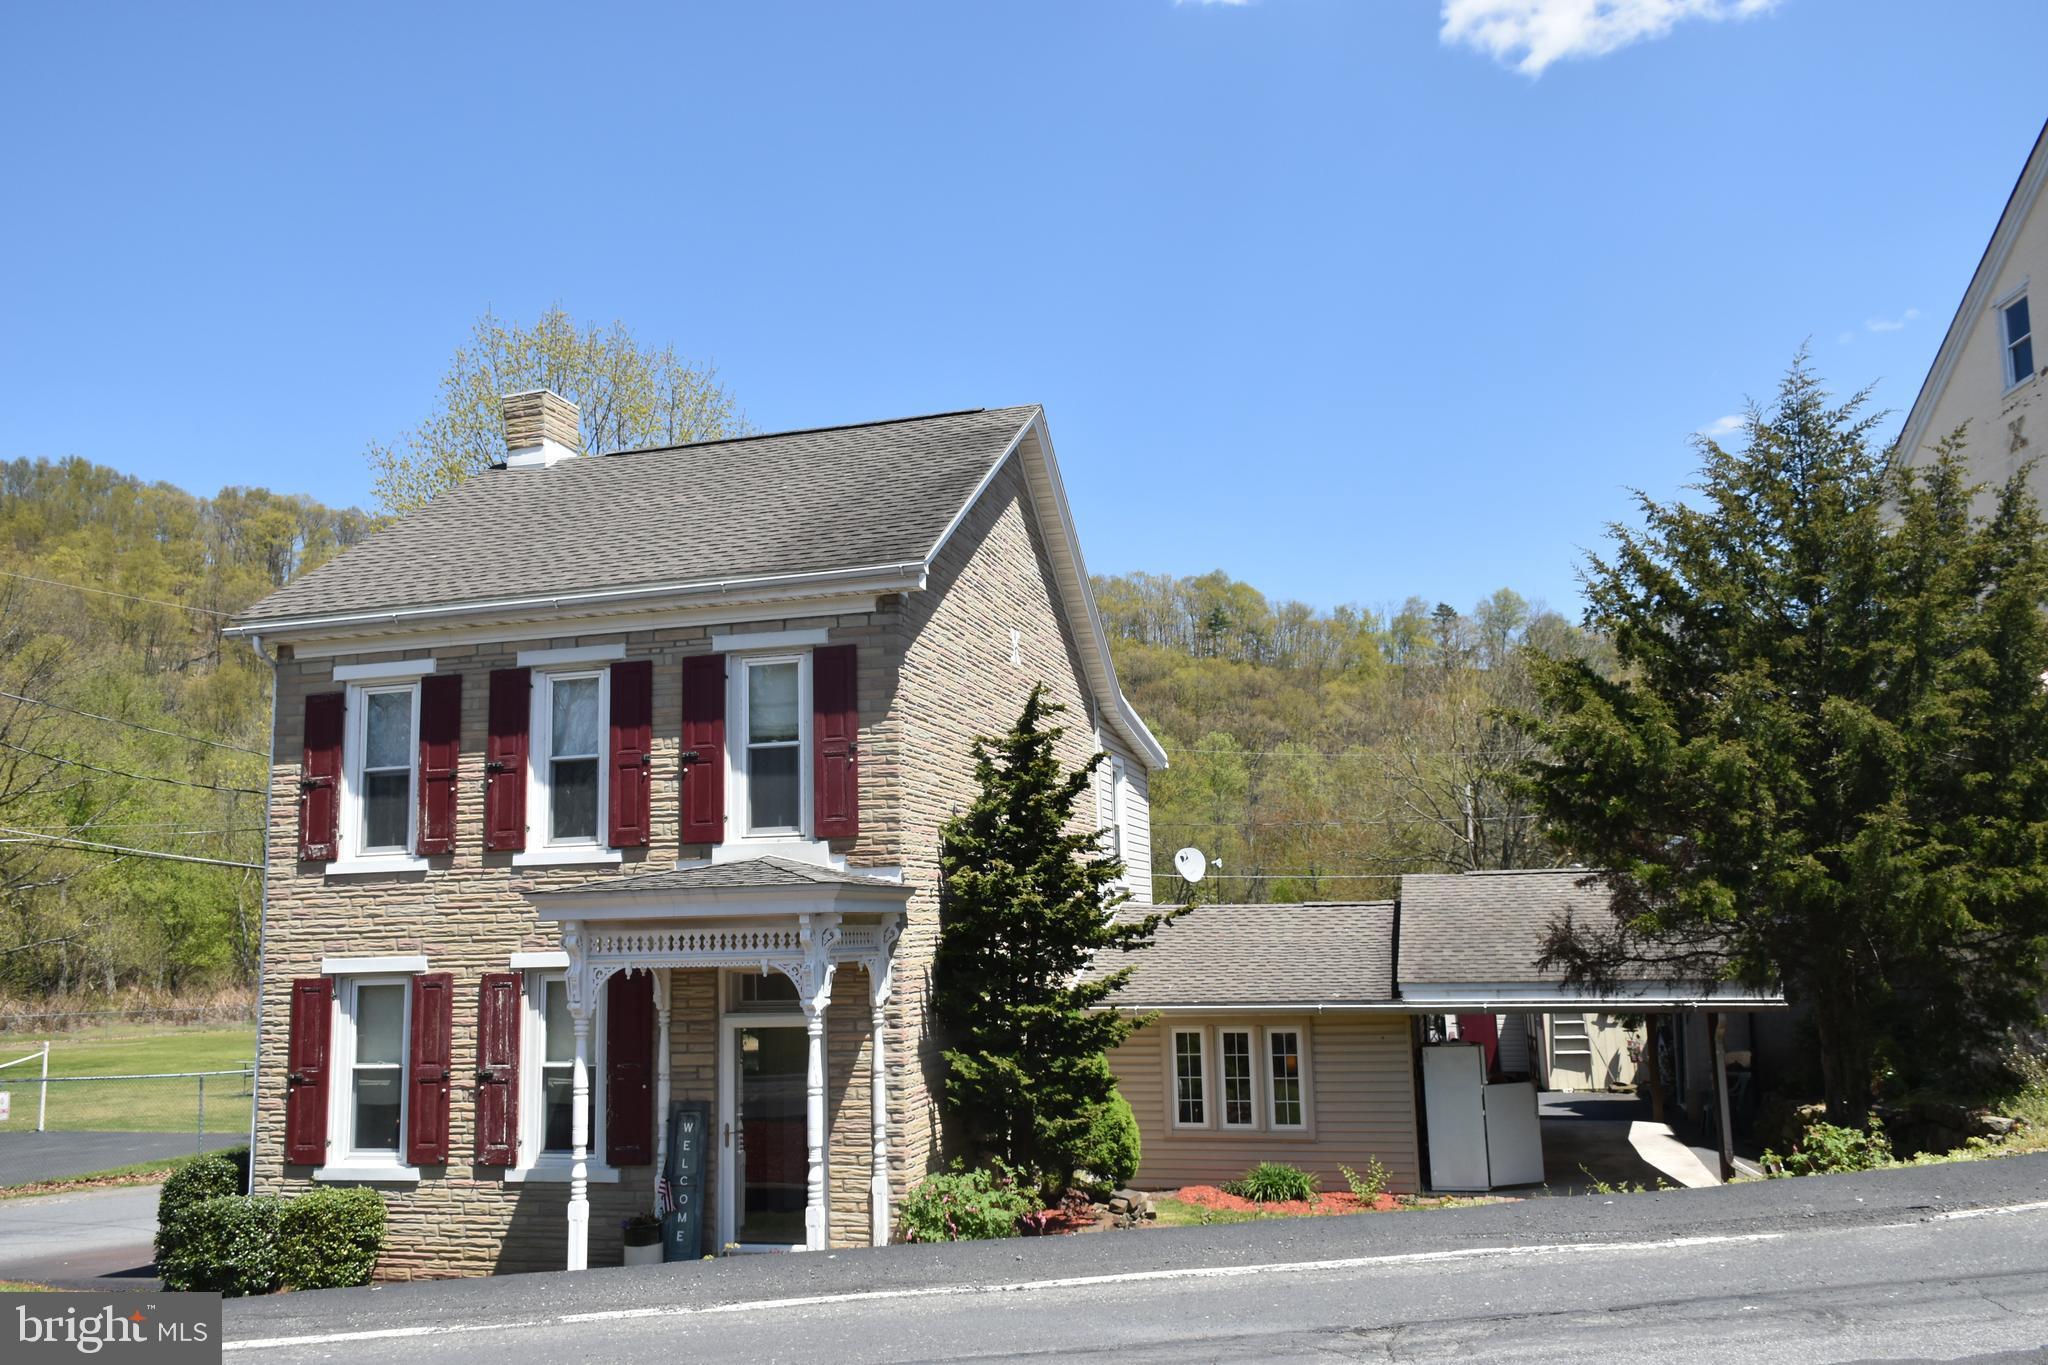 201 Main Street, Landingville, PA 17942